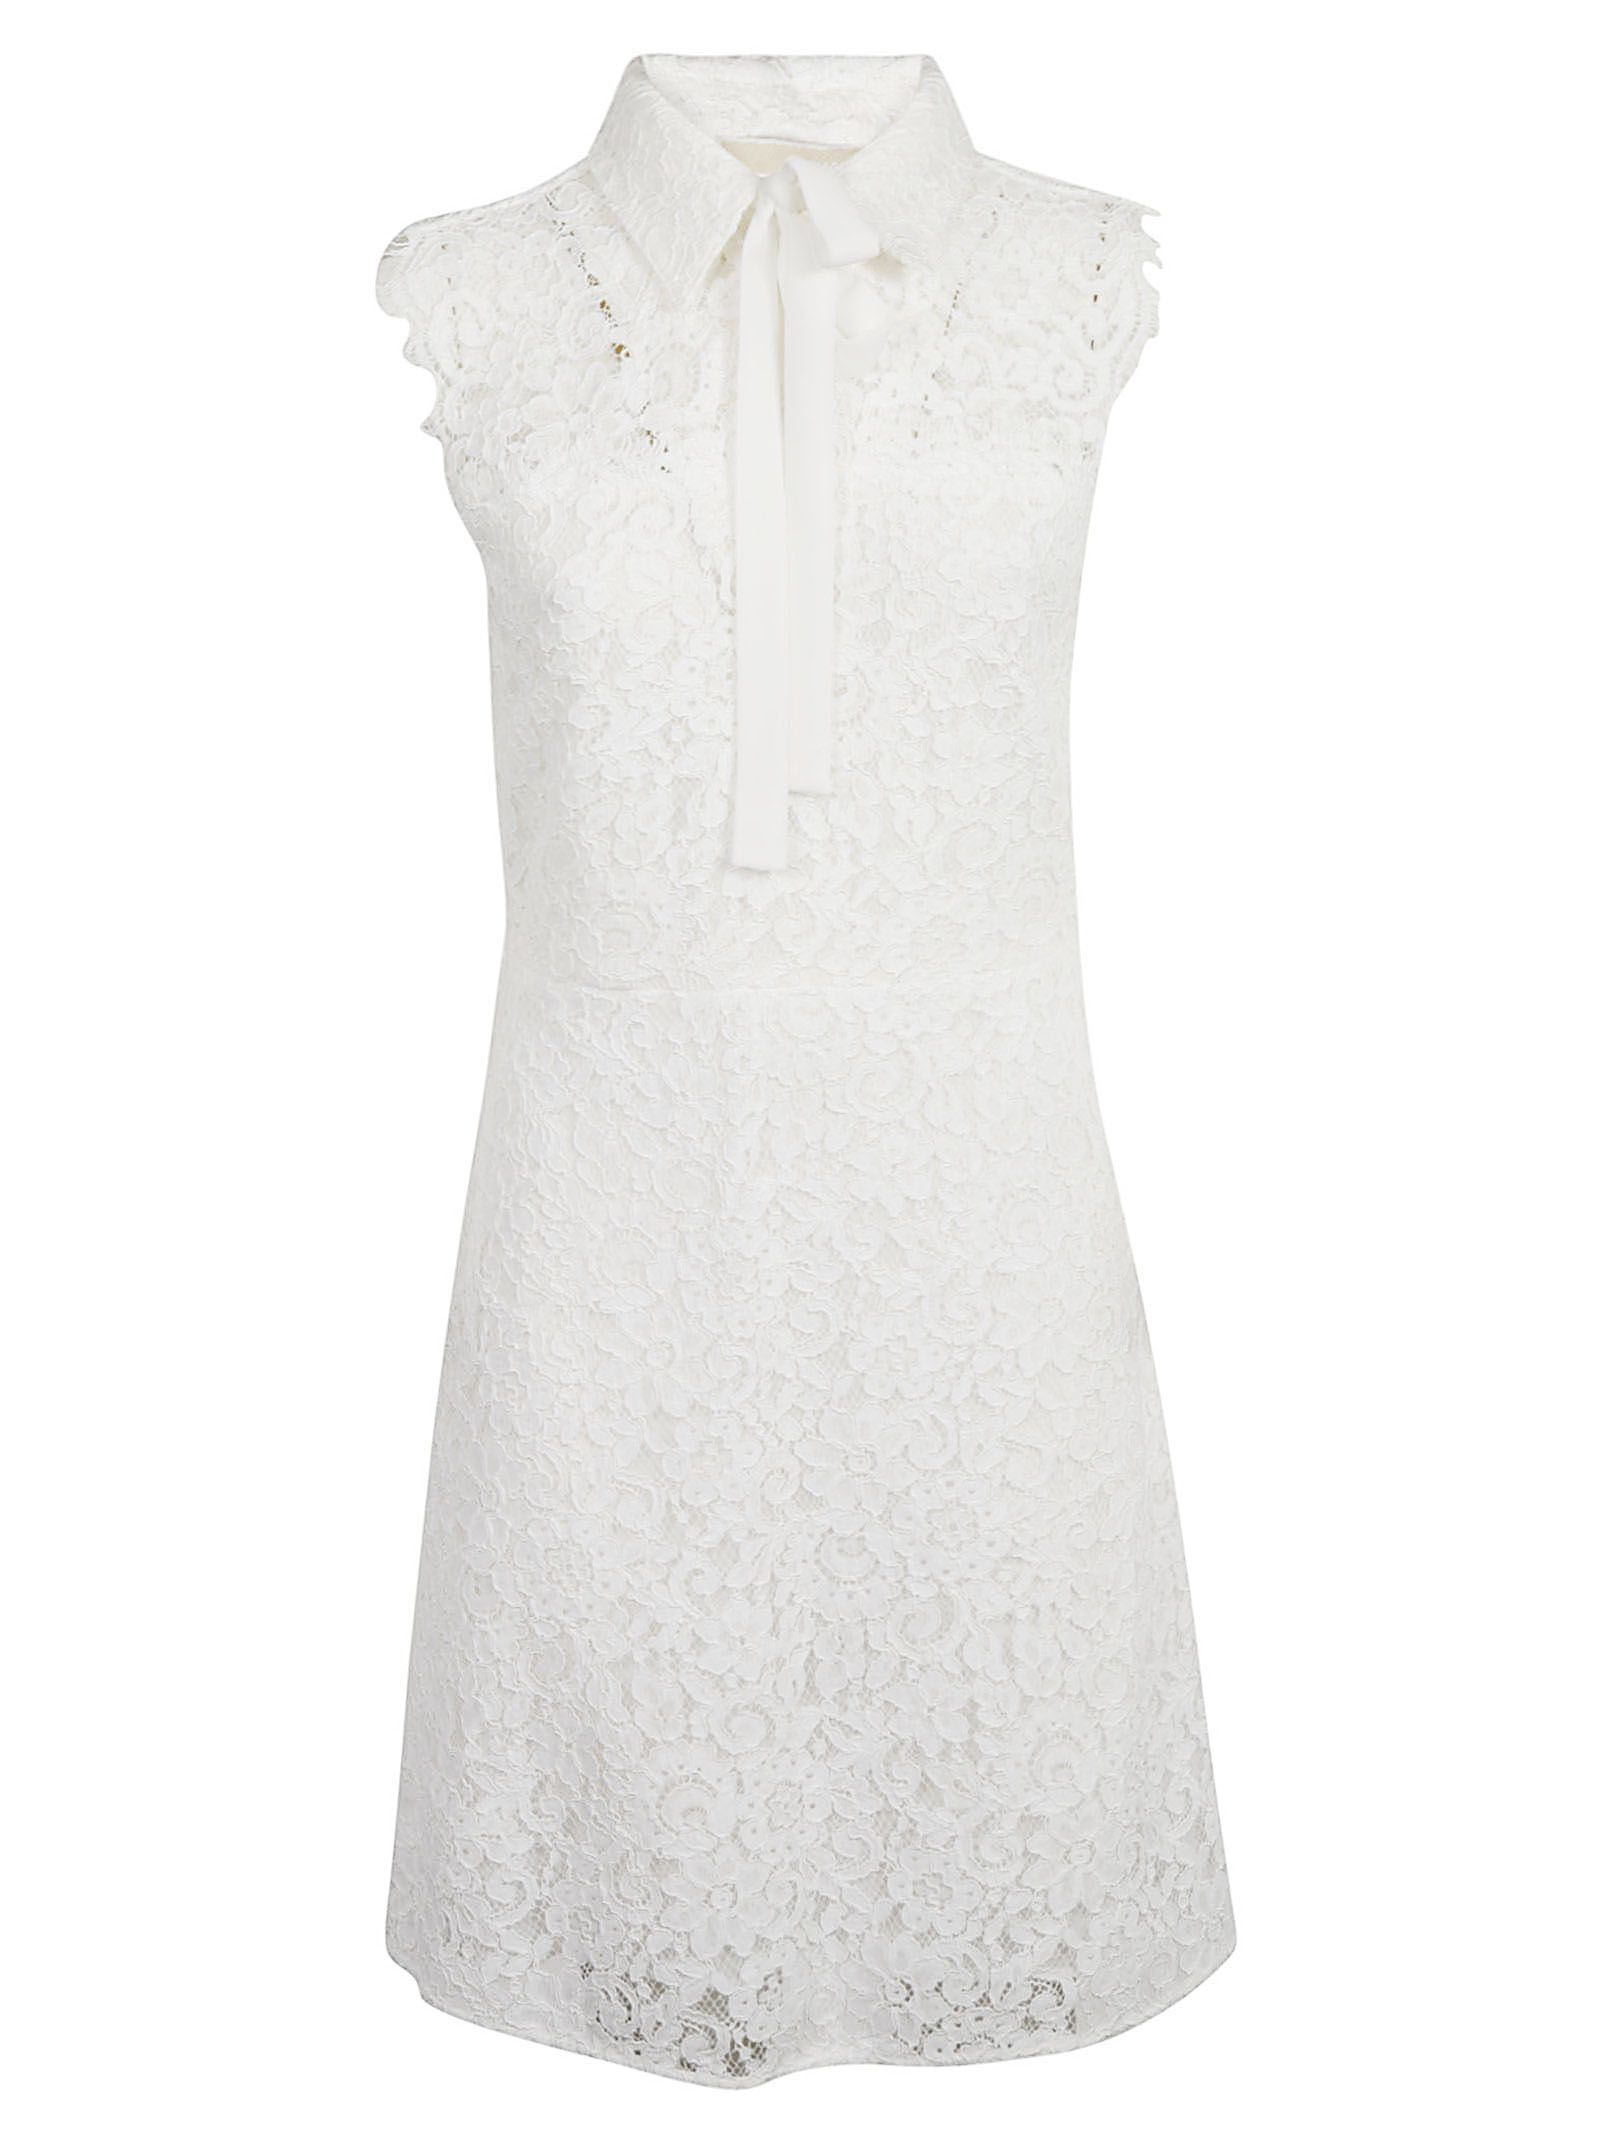 a9fb422ab08 Michael Kors Michael Kors Floral Lace Dress - White - 10837828